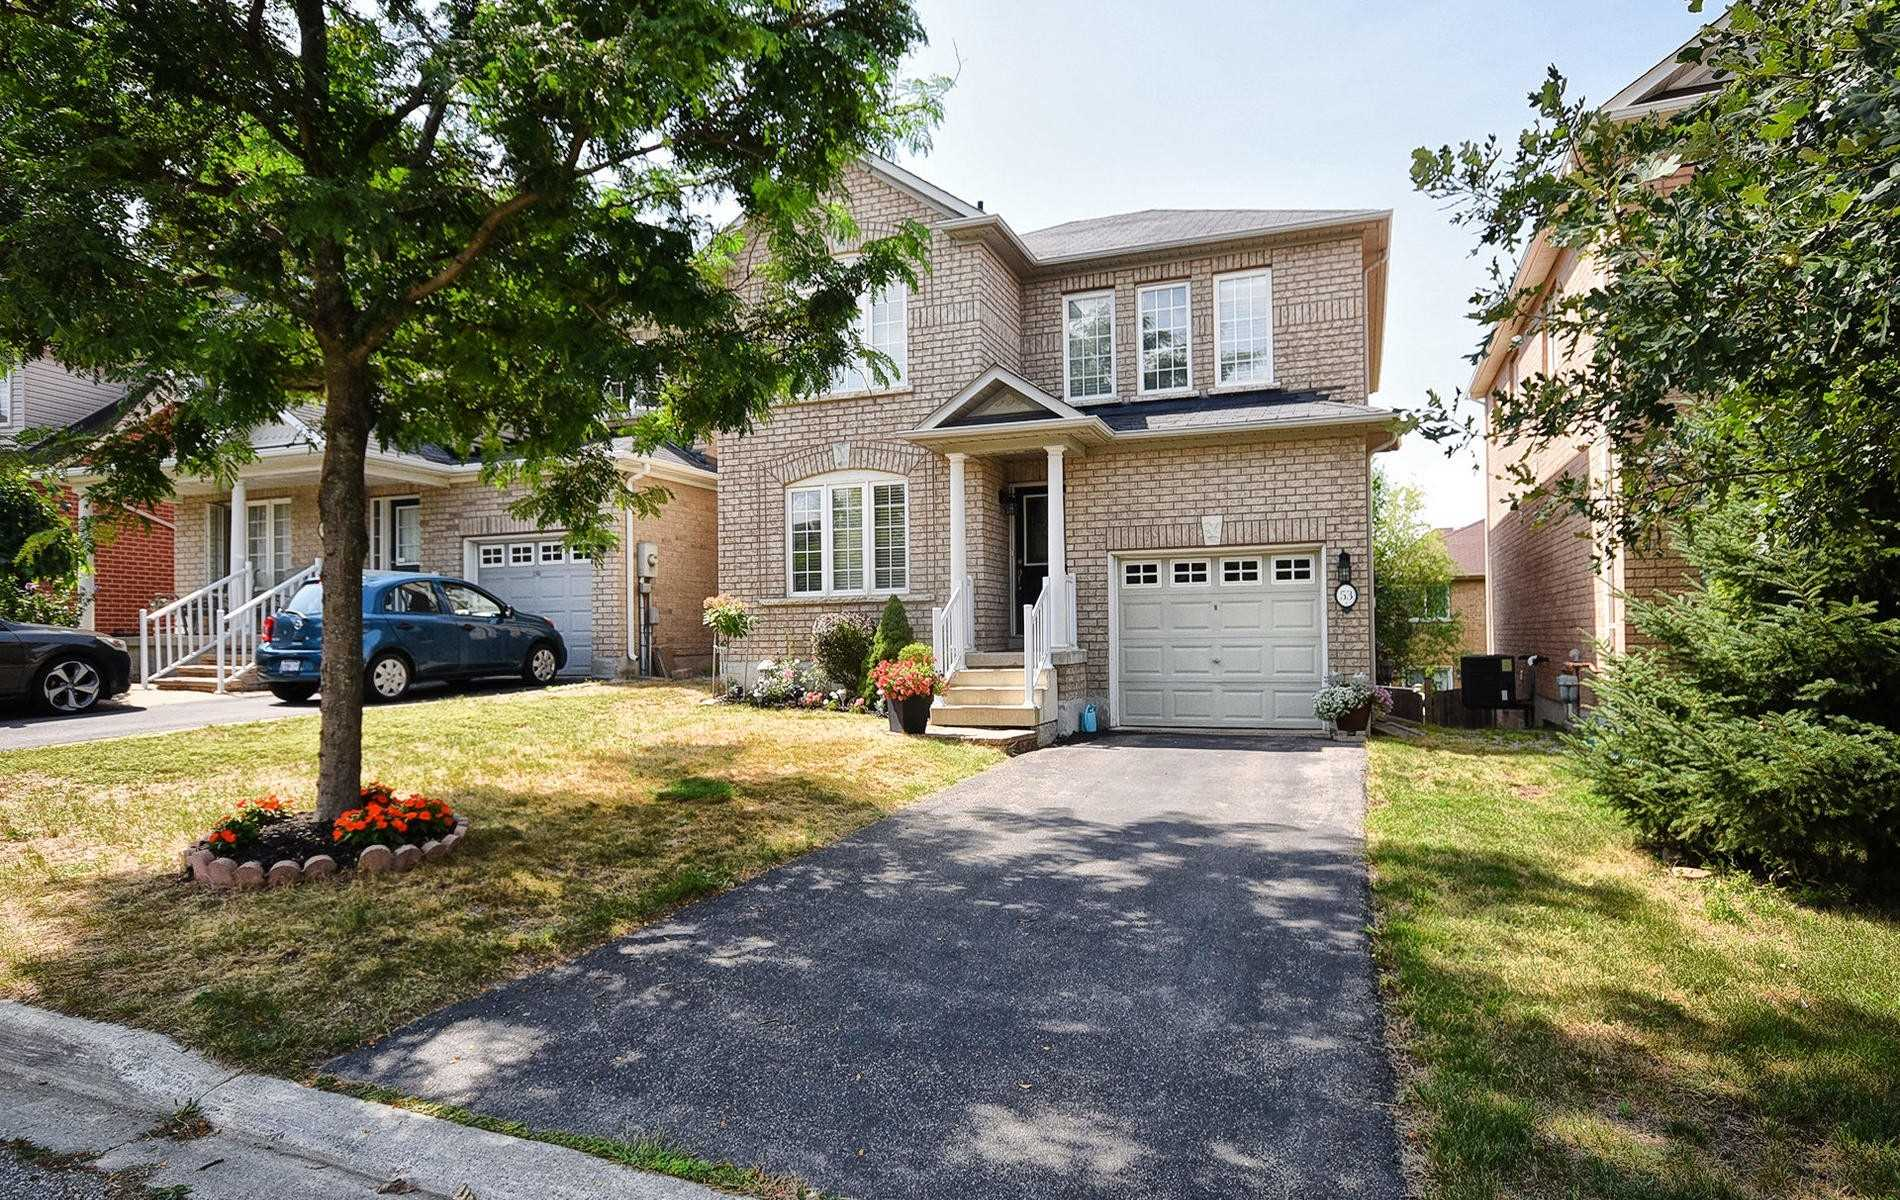 53 Knapton Dr, Newmarket, Ontario L3X3A9, 3 Bedrooms Bedrooms, 7 Rooms Rooms,3 BathroomsBathrooms,Detached,For Sale,Knapton,N4912134